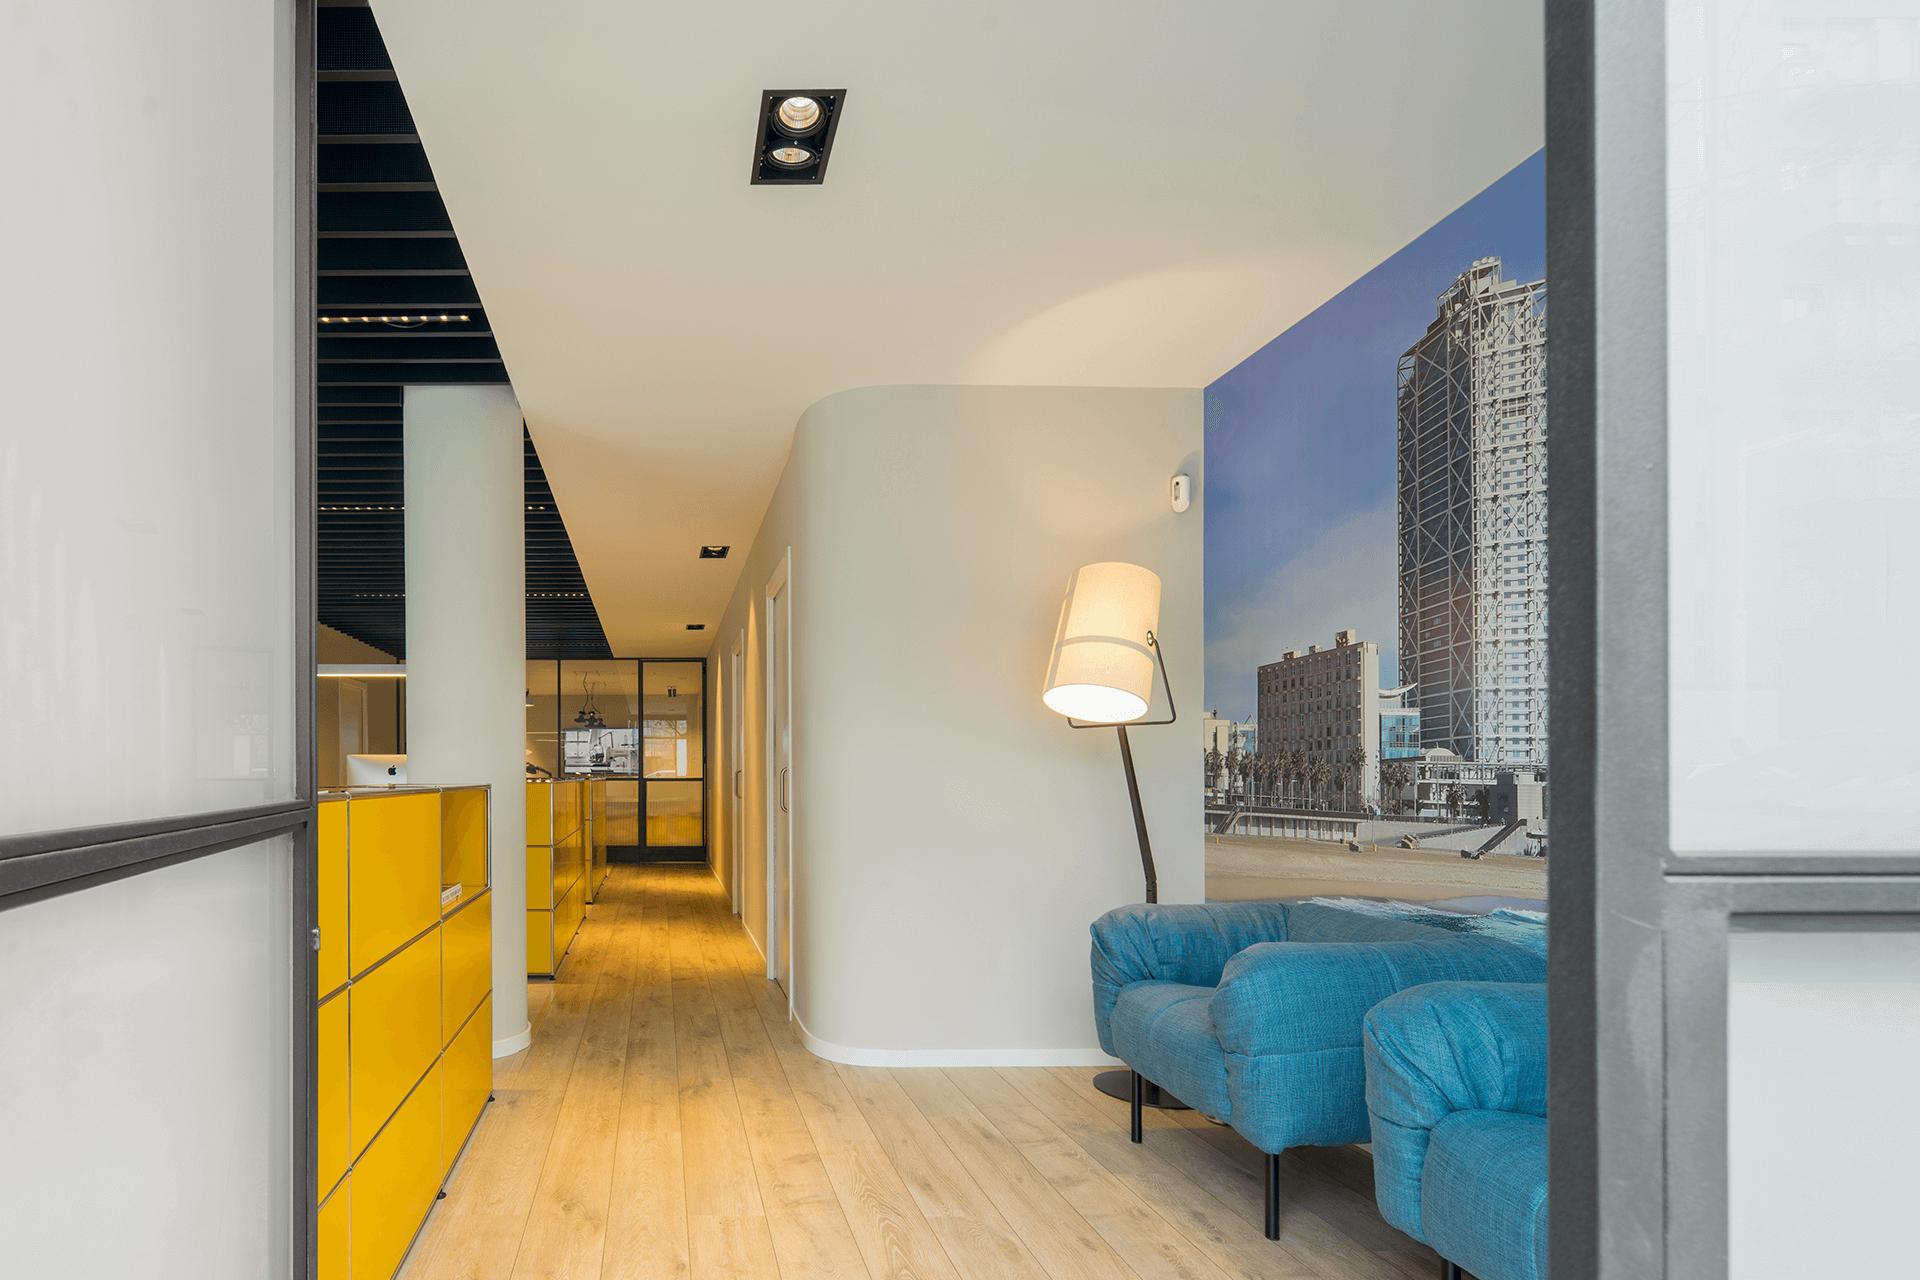 Interiorista Decorador Barcelona | The Room Studio